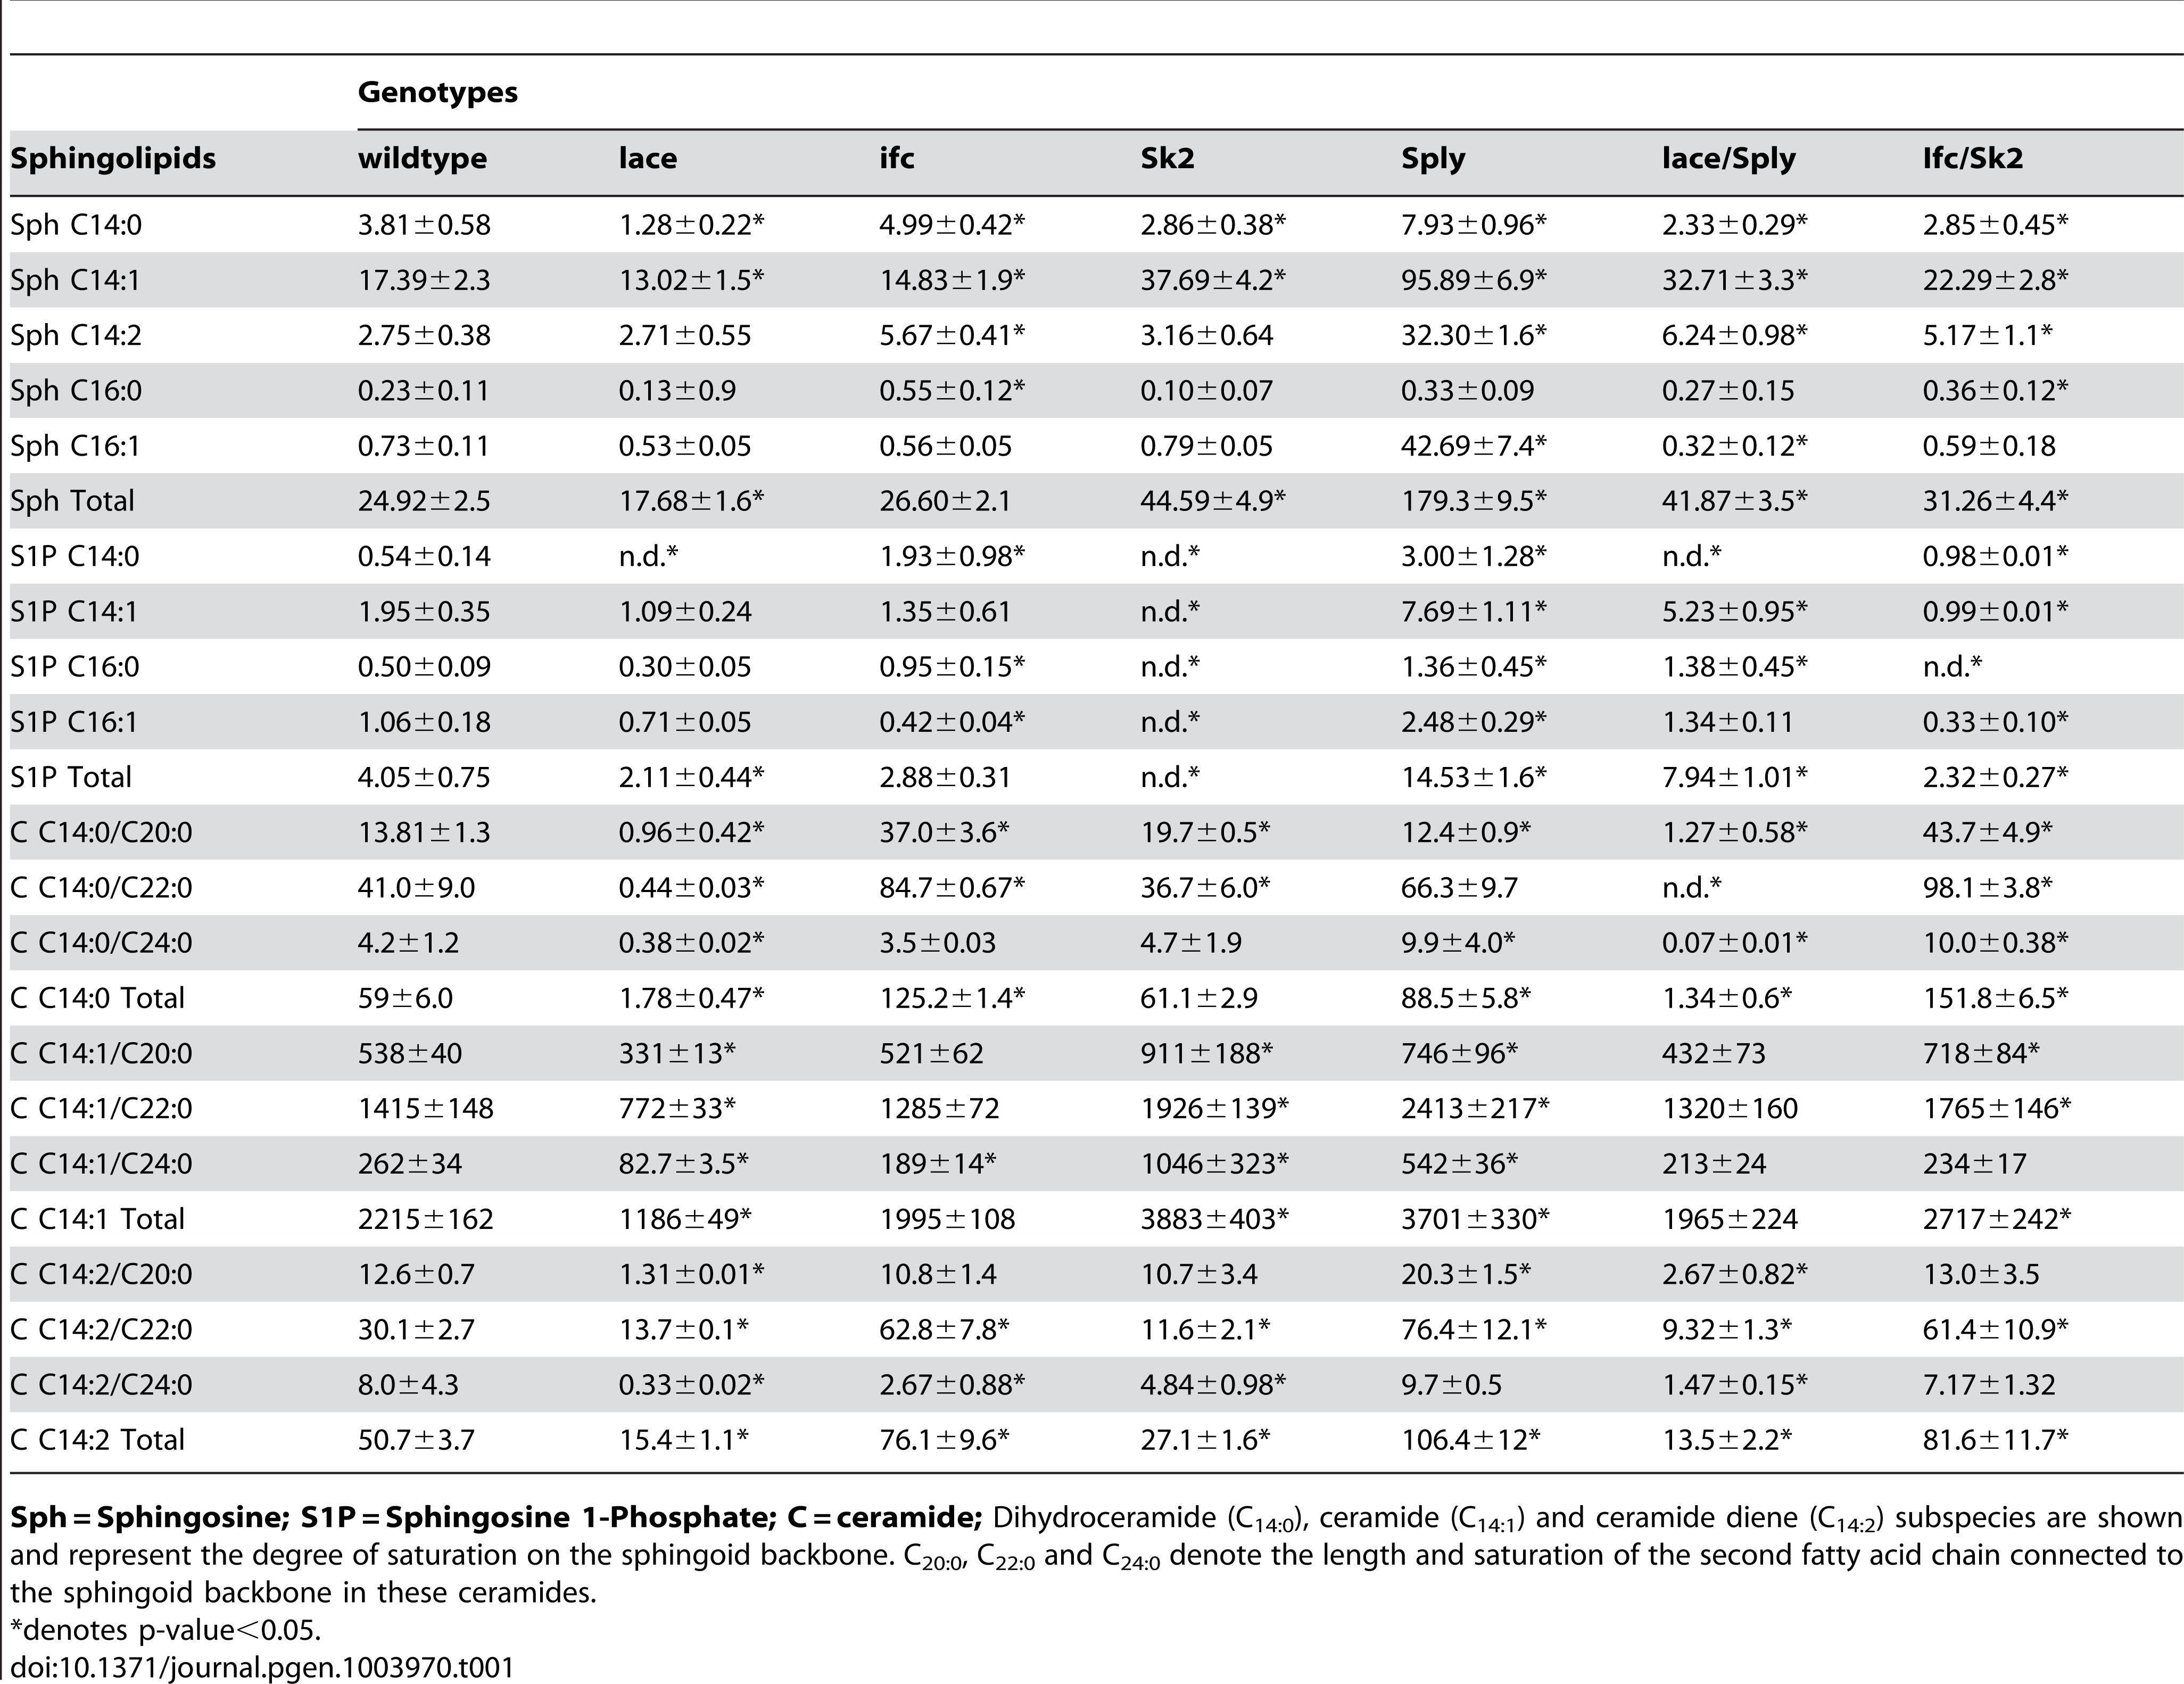 Sphingolipidomic profiles of SL mutants.